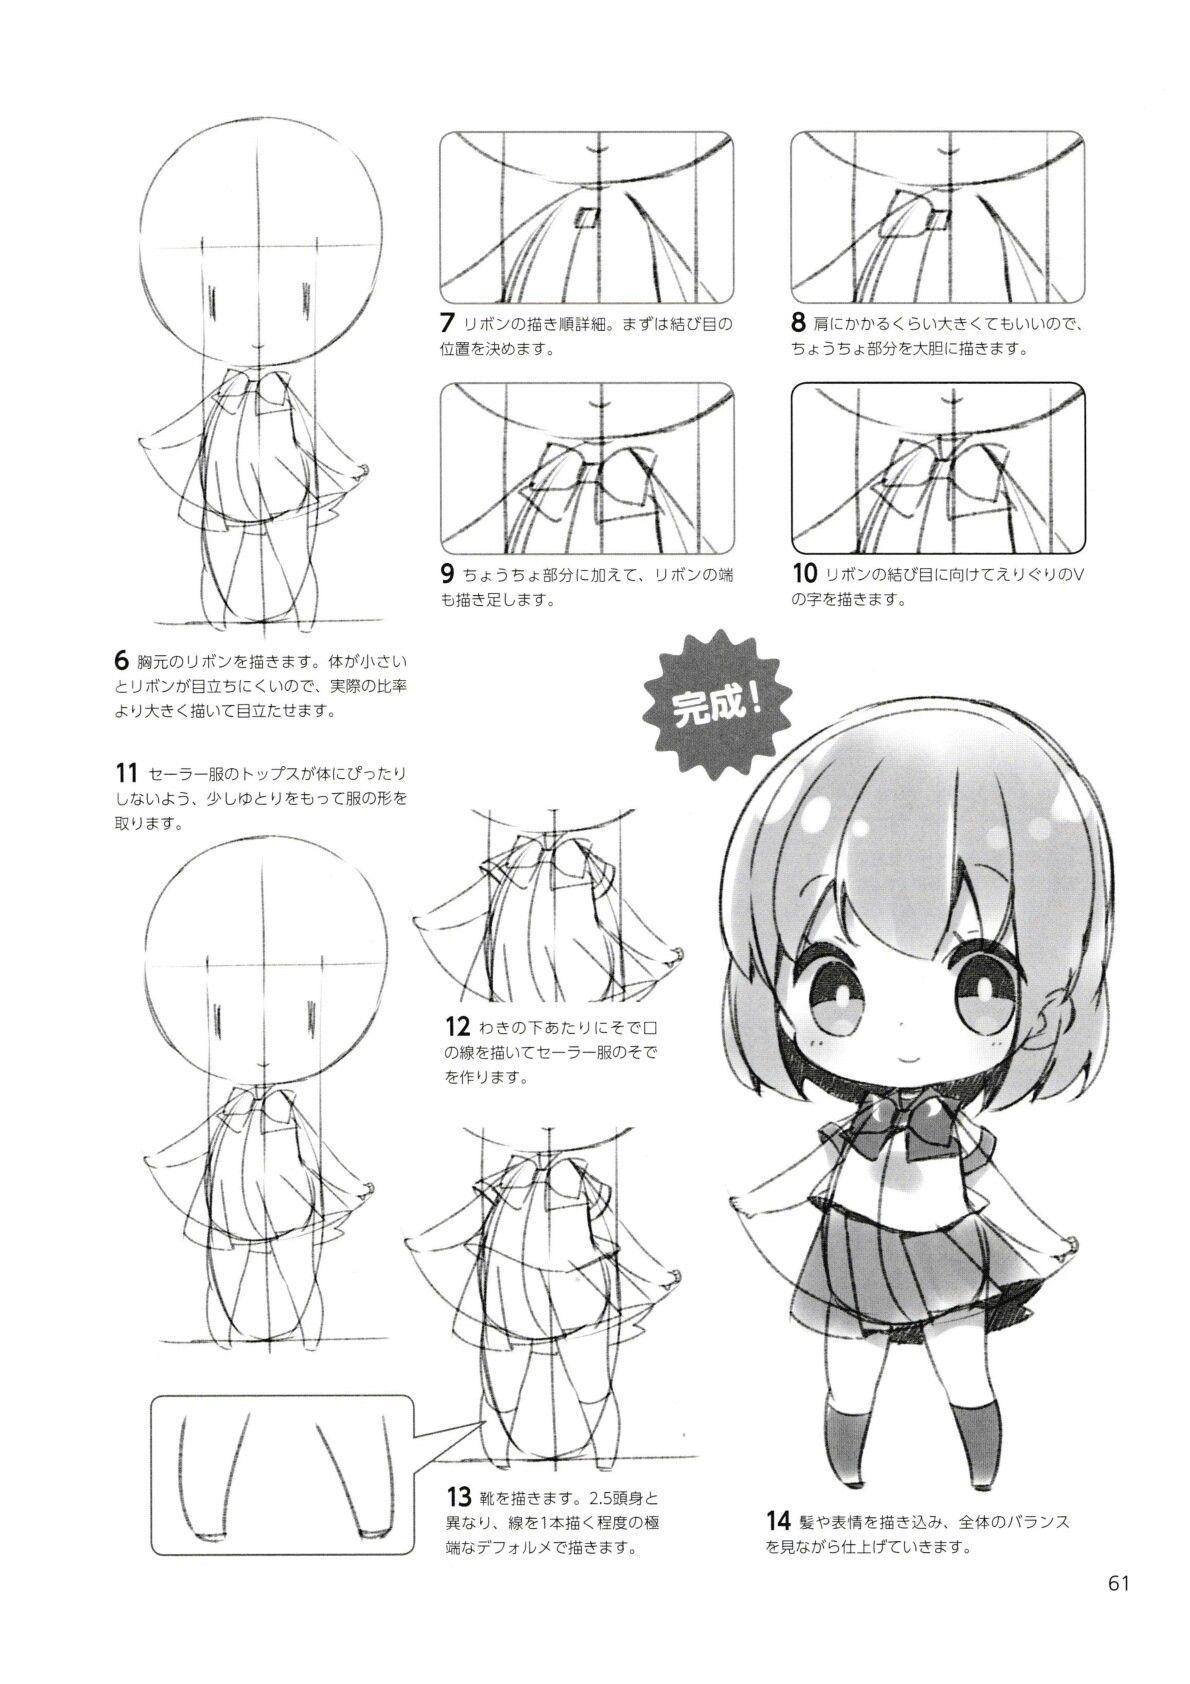 Pin By Komal Fatima On Chibi Anime Drawing Books Manga Drawing Tutorials Chibi Sketch